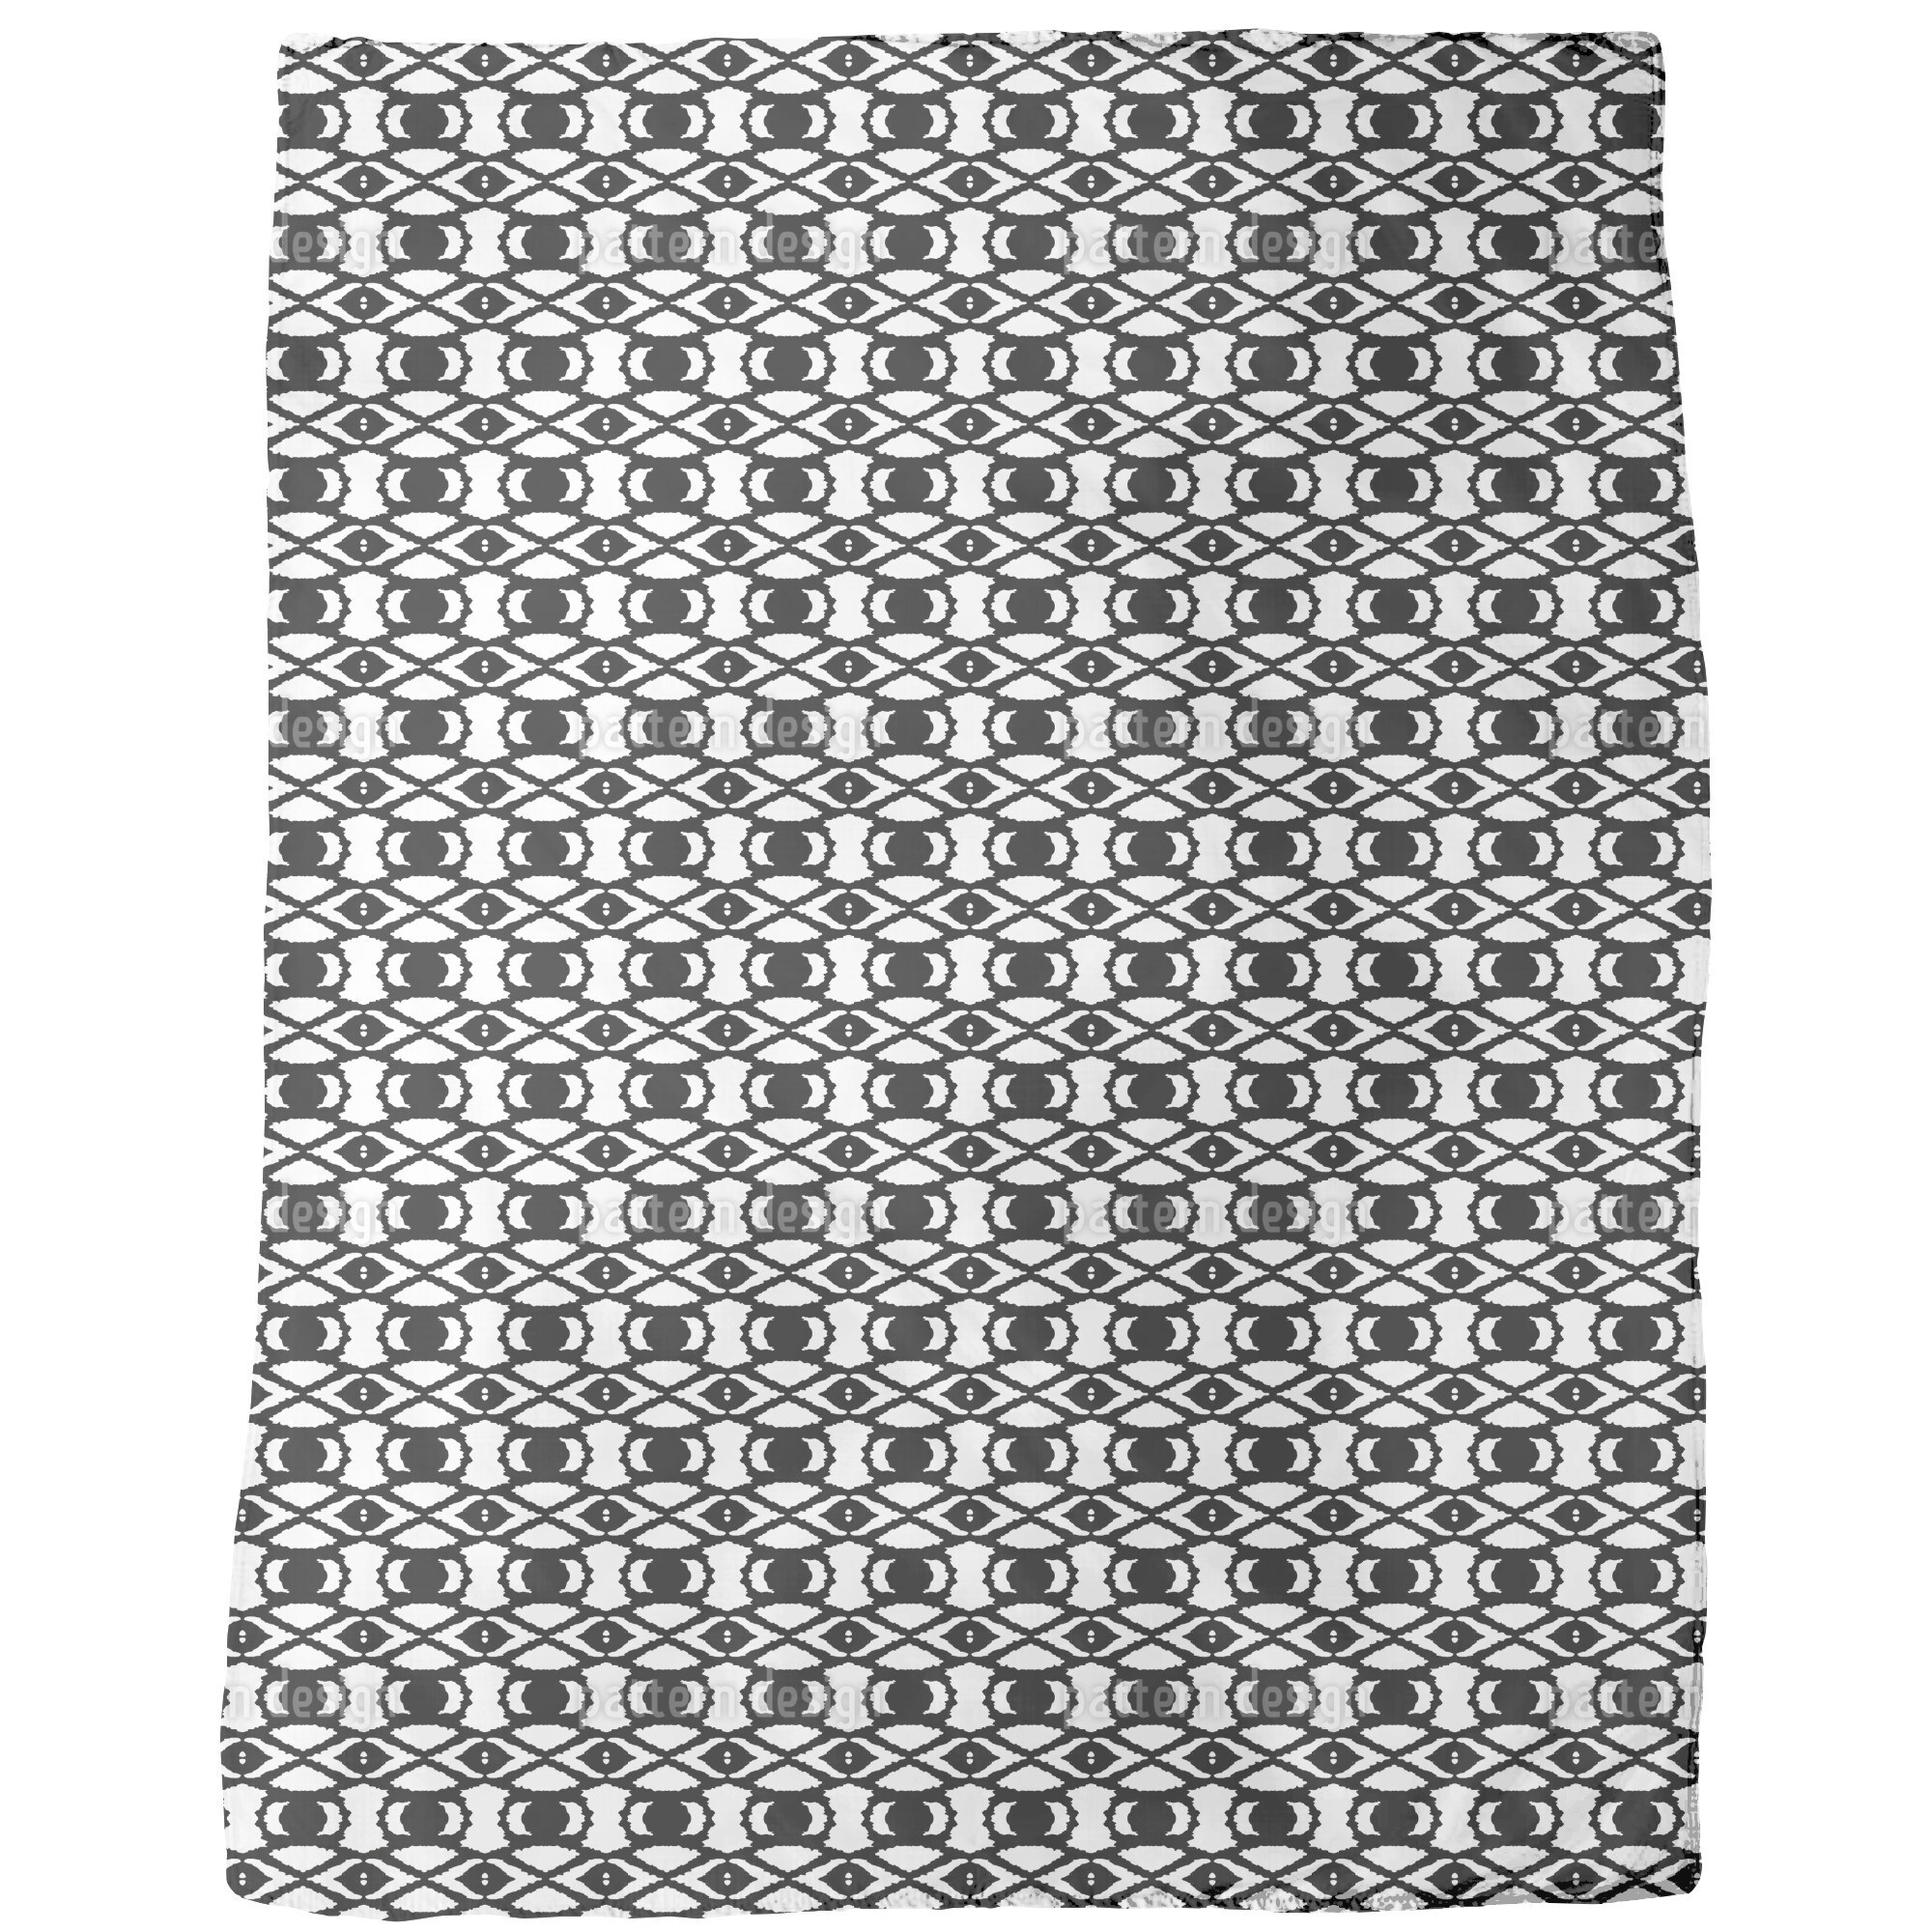 Uneekee Eyes of Africa Fleece Blanket (Small), Black